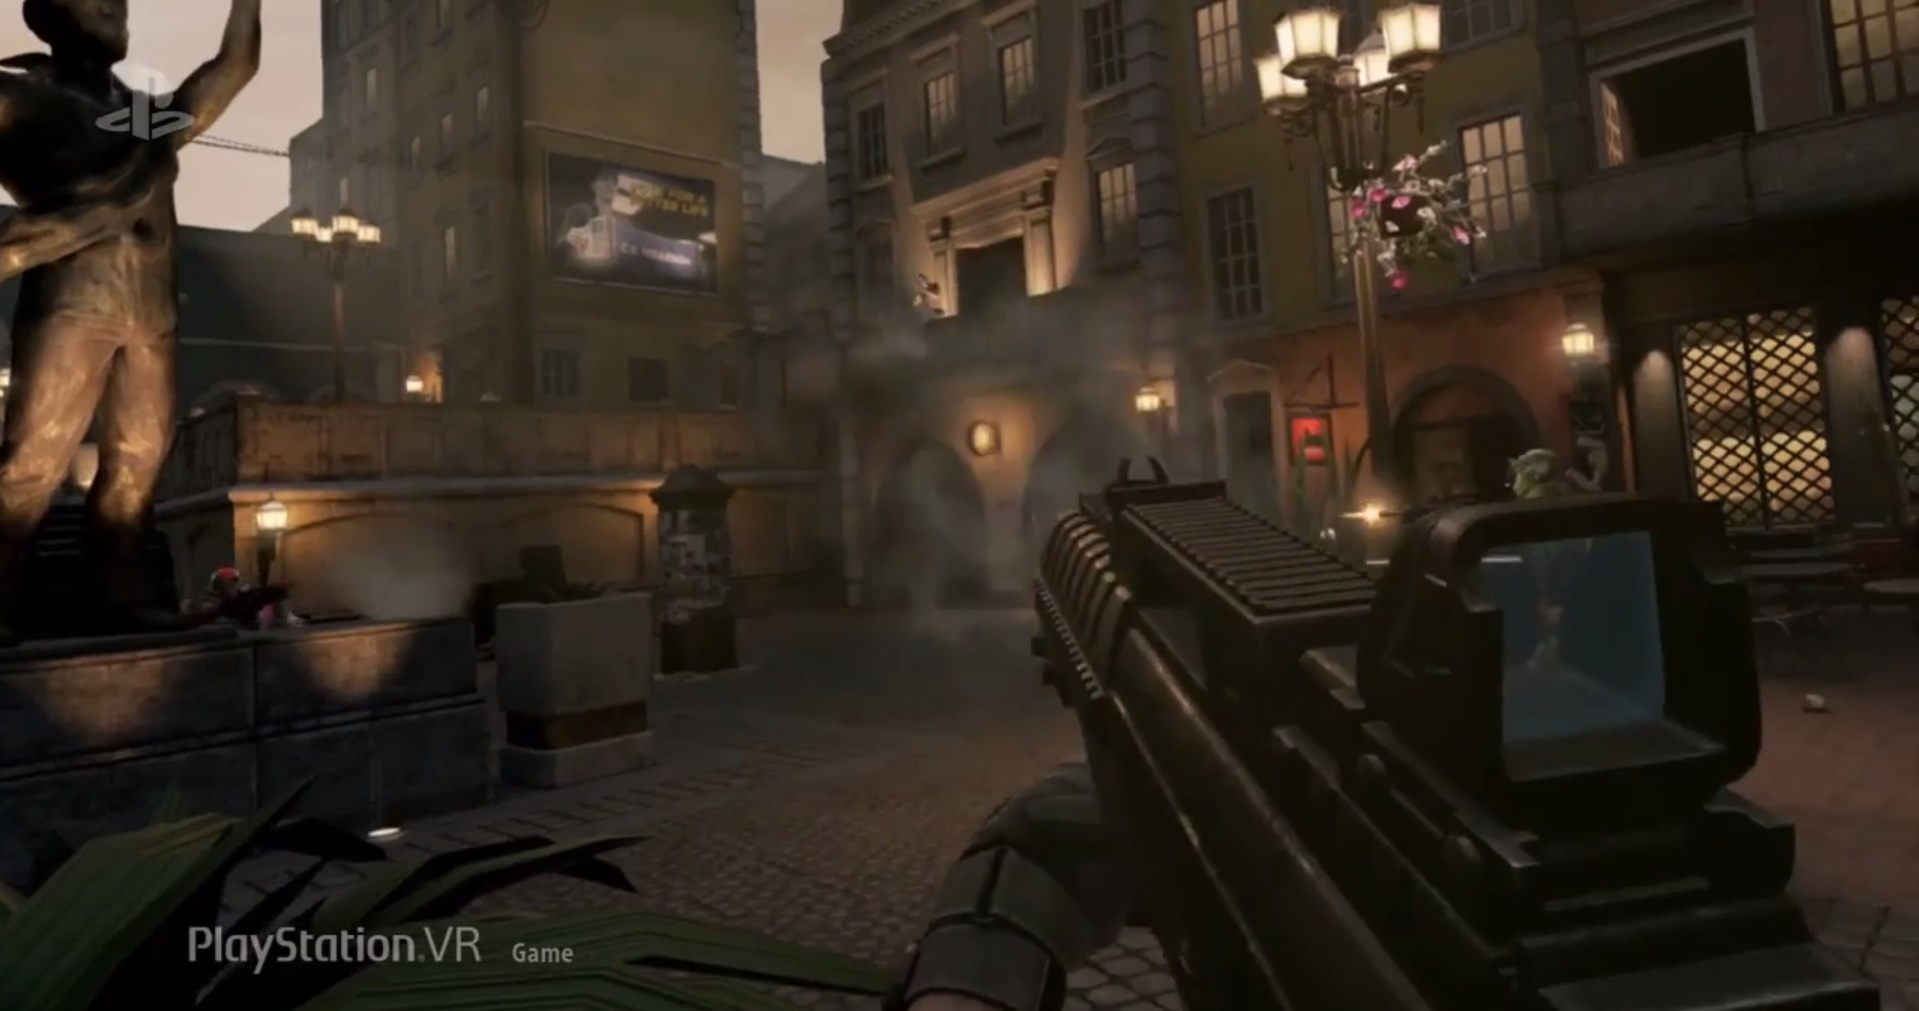 The Until Dawn developer is also making a shooter called Bravo Team screenshot